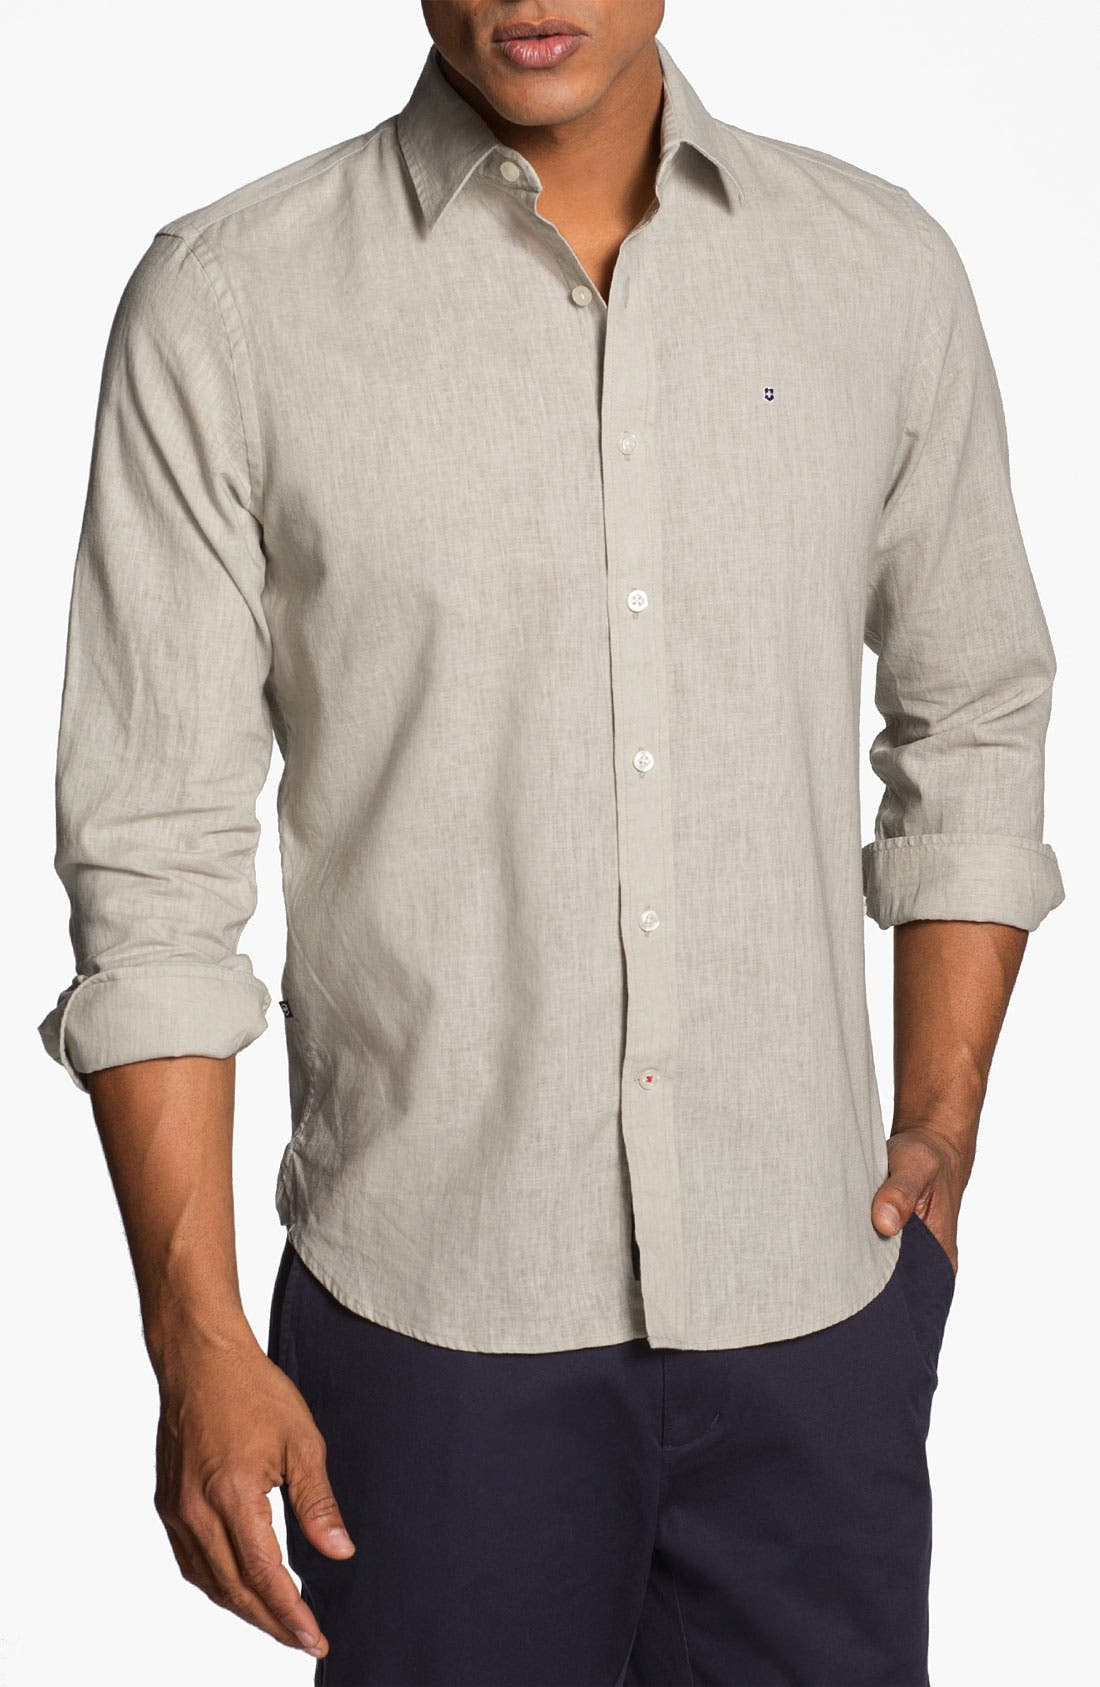 Alternate Image 1 Selected - Victorinox Swiss Army® 'Villamont' Linen Blend Sport Shirt (Online Only)